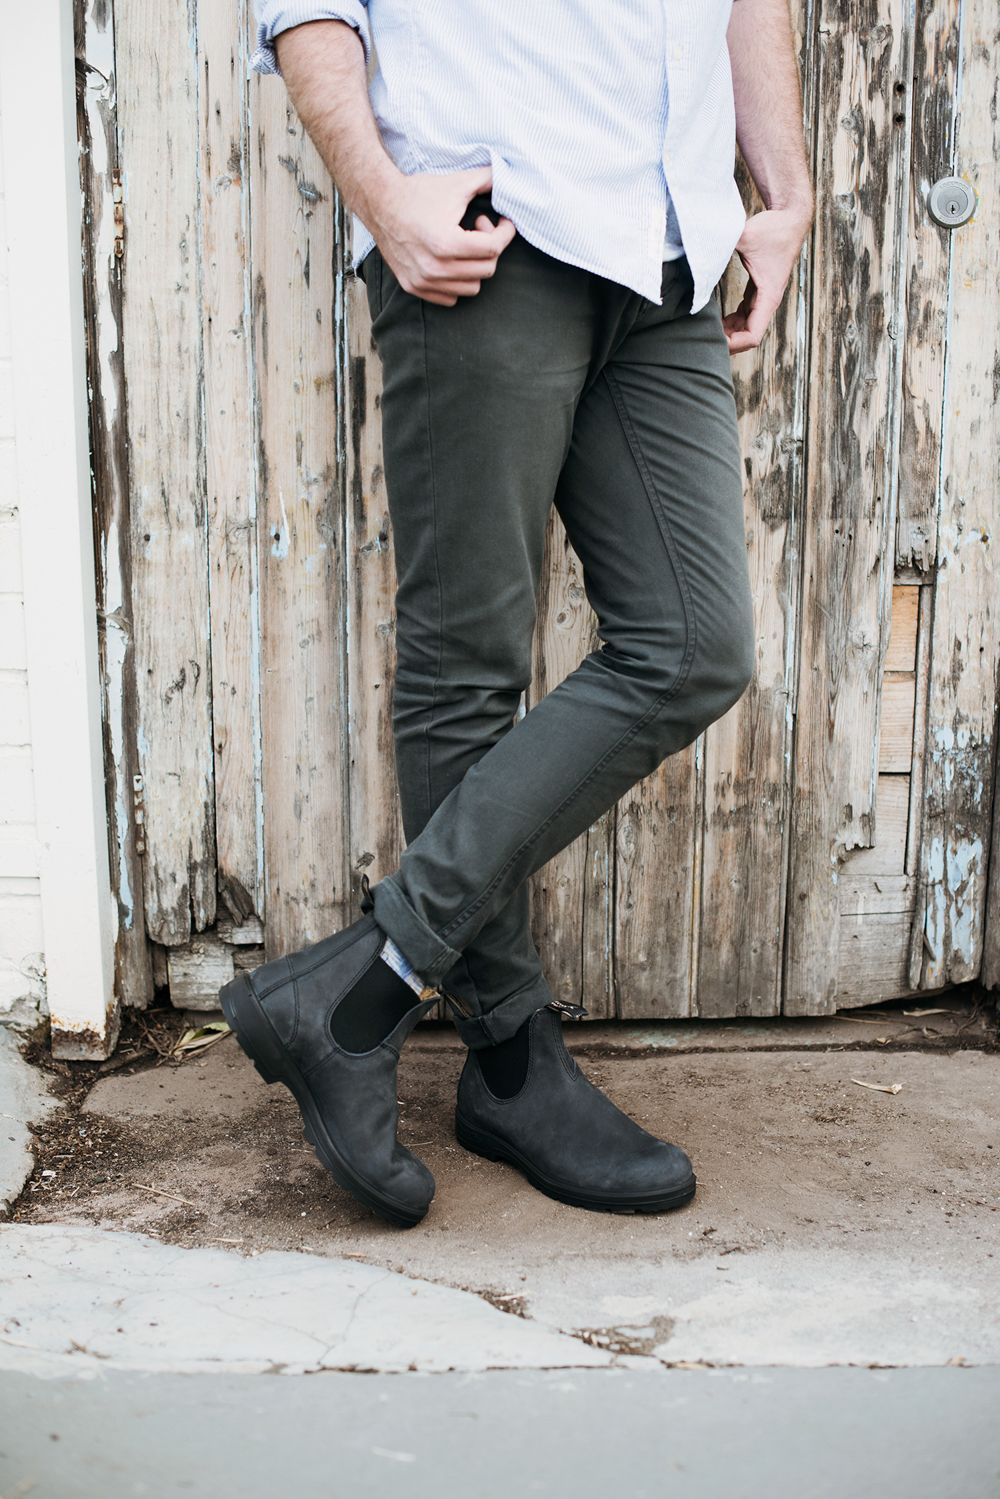 Blundstone 587 Boot Rustic Black | Blundstone boots, Black